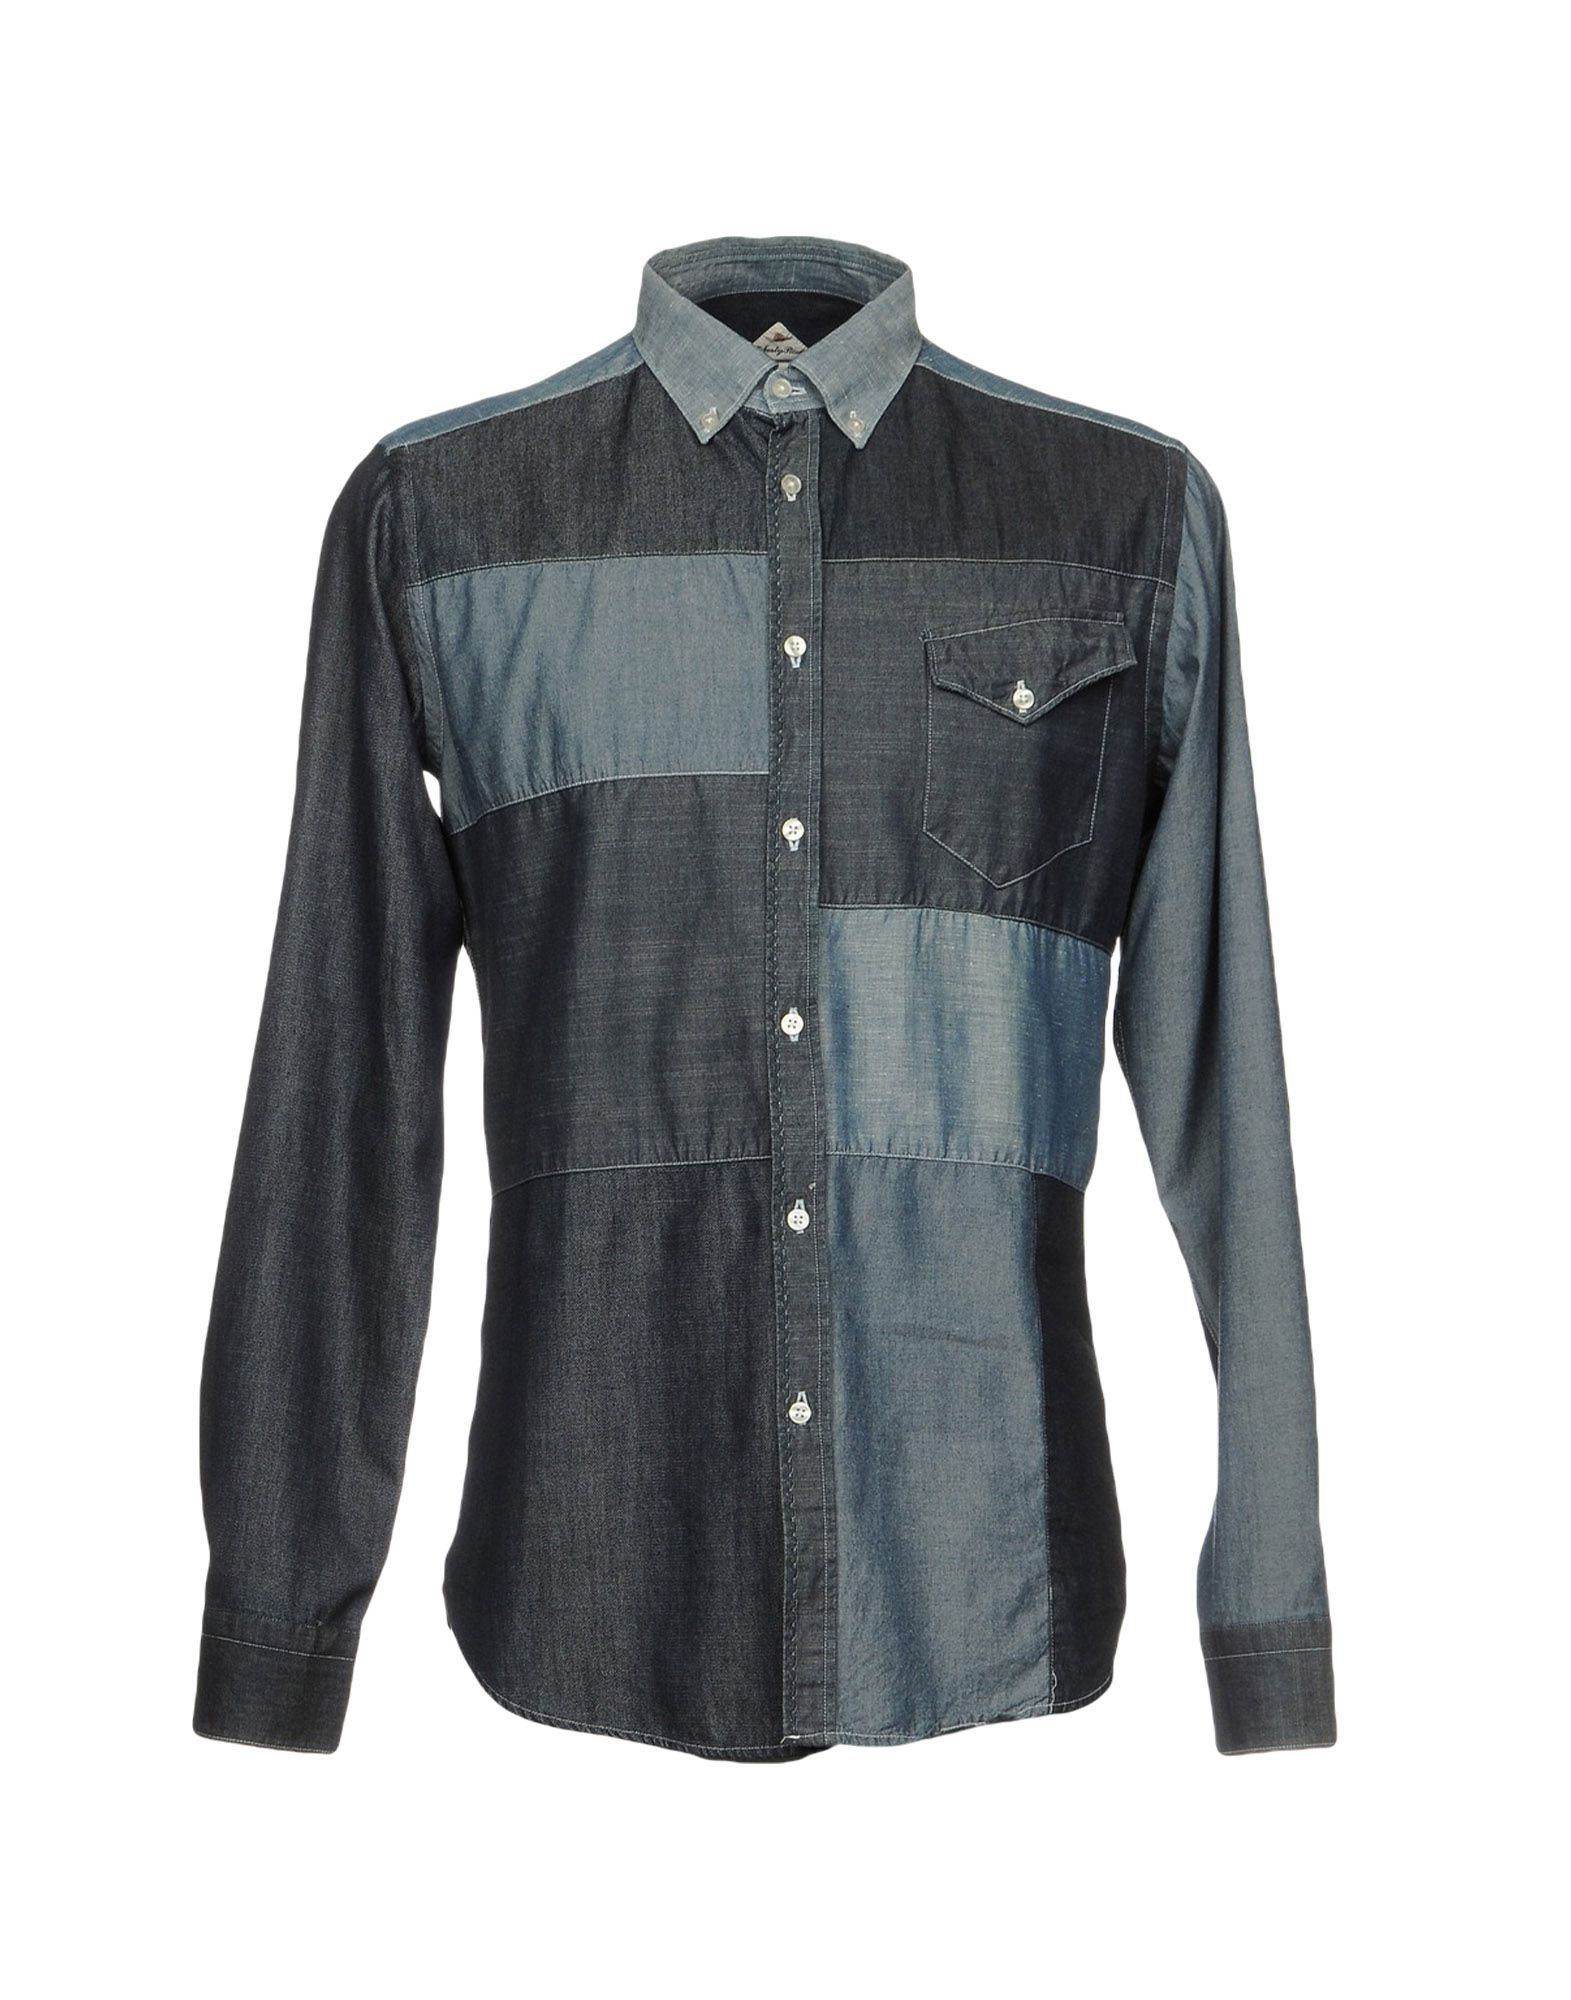 LIBERTY ROSE Джинсовая рубашка рубашка в клетку insight liberty beet